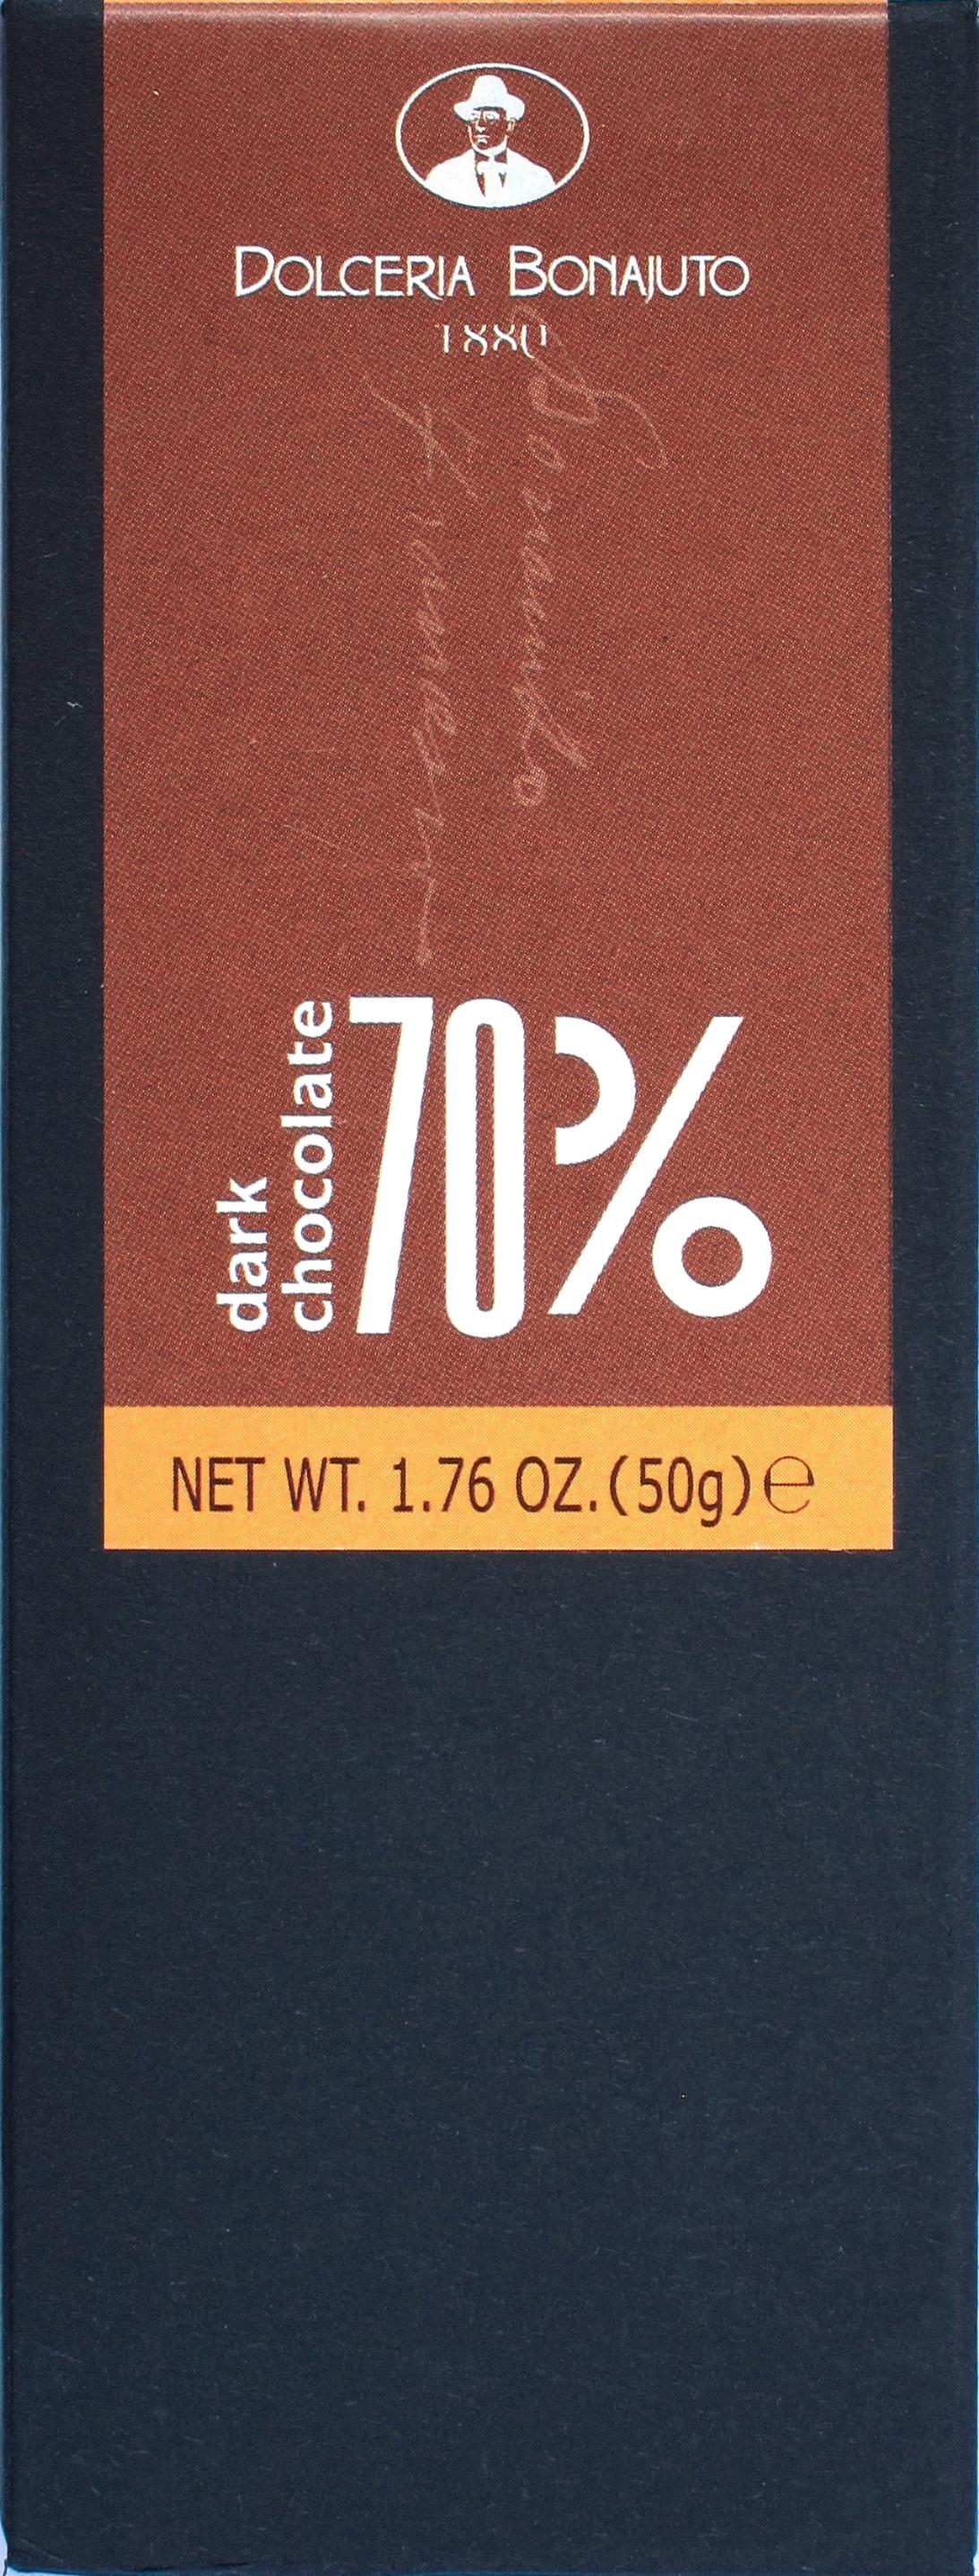 Antica Dolceria Bonajuto, 70%-Bitterschokolade